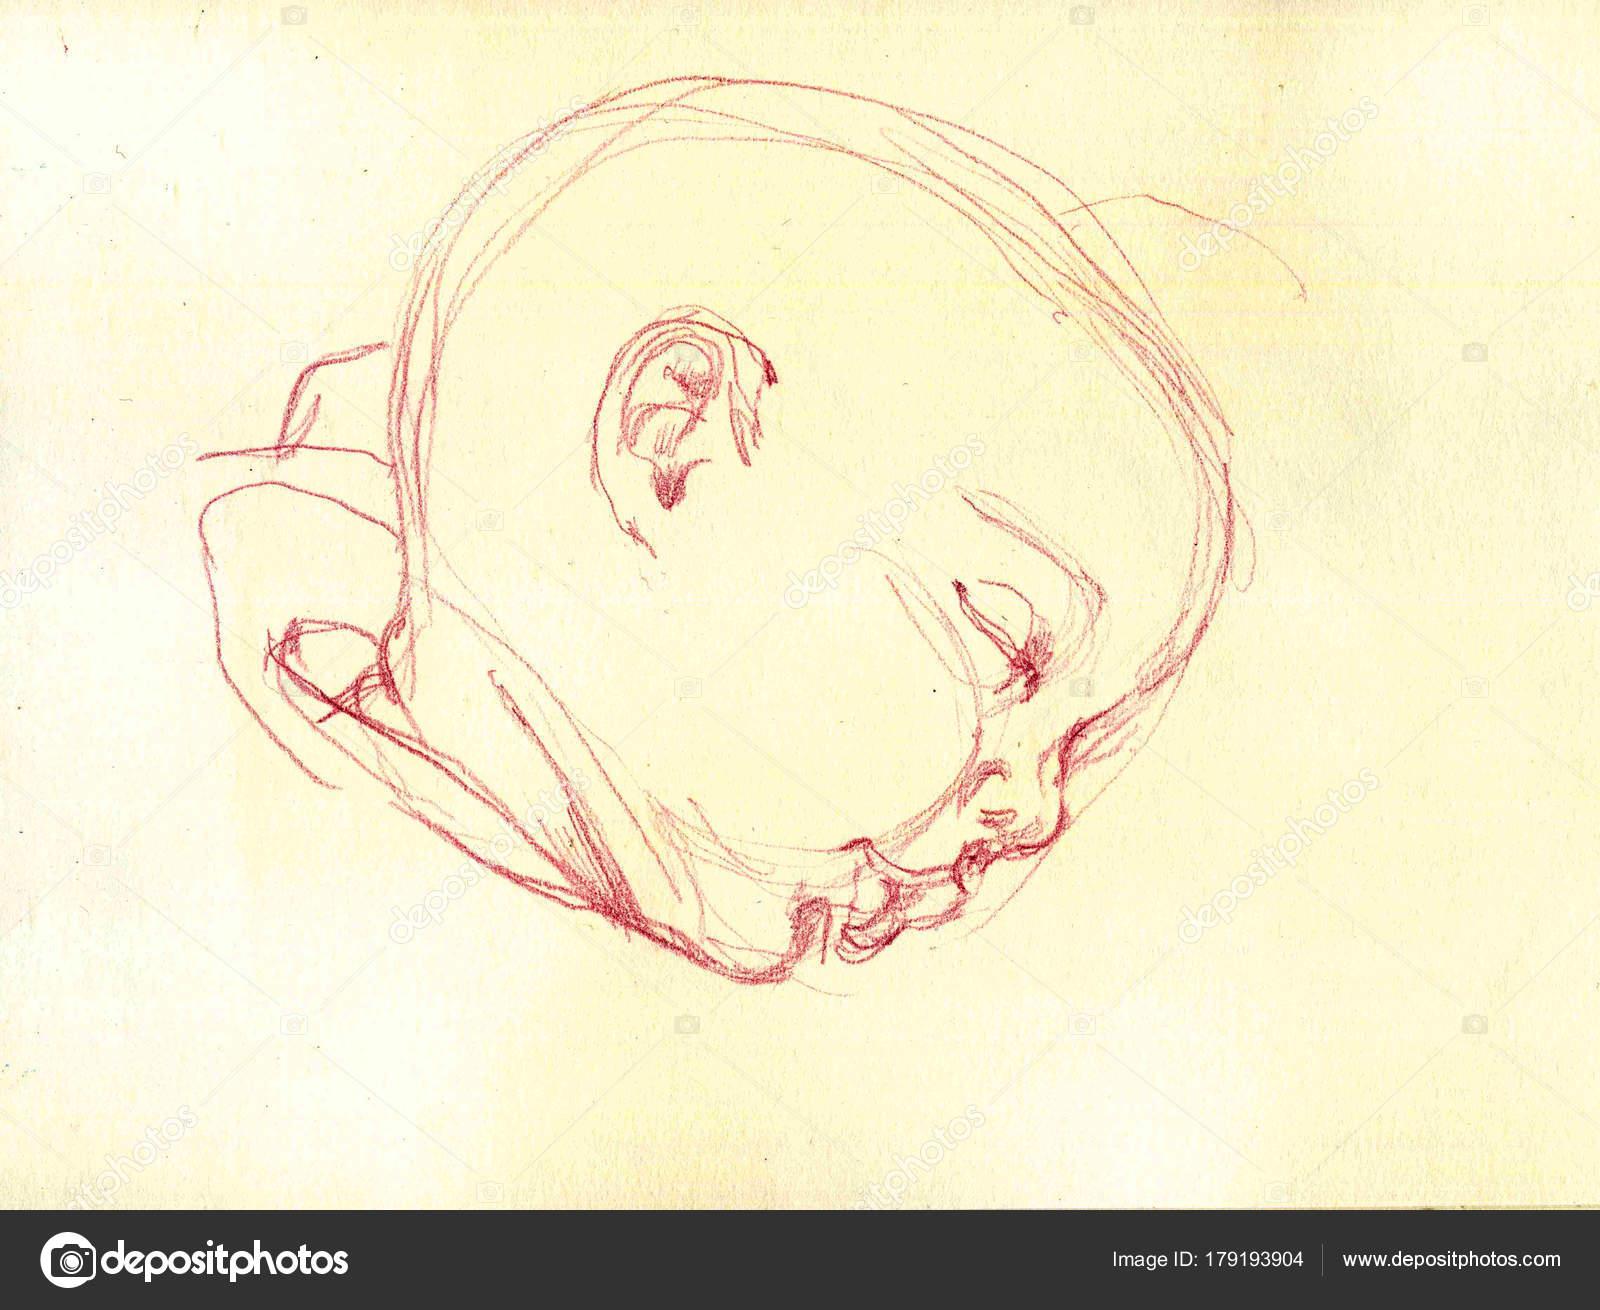 Cute Simple Line Art : Cute sleeping baby drawing simple illustration u stock photo